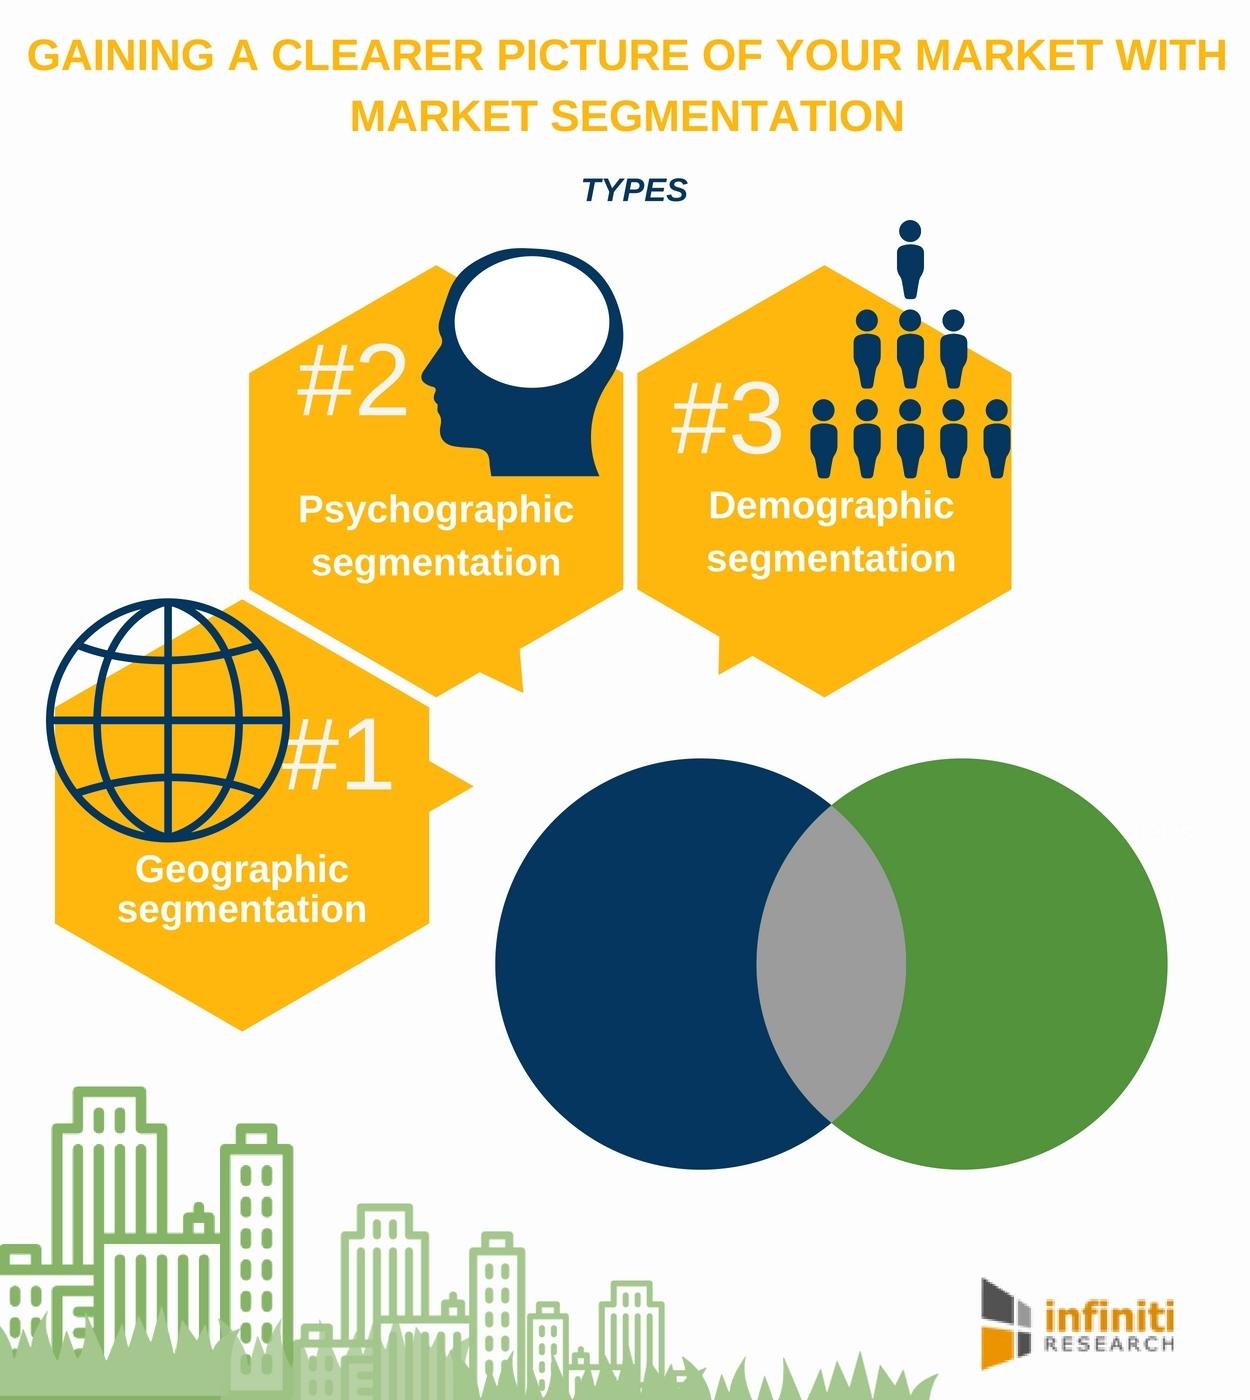 different types of market segmentation strategies that best suit